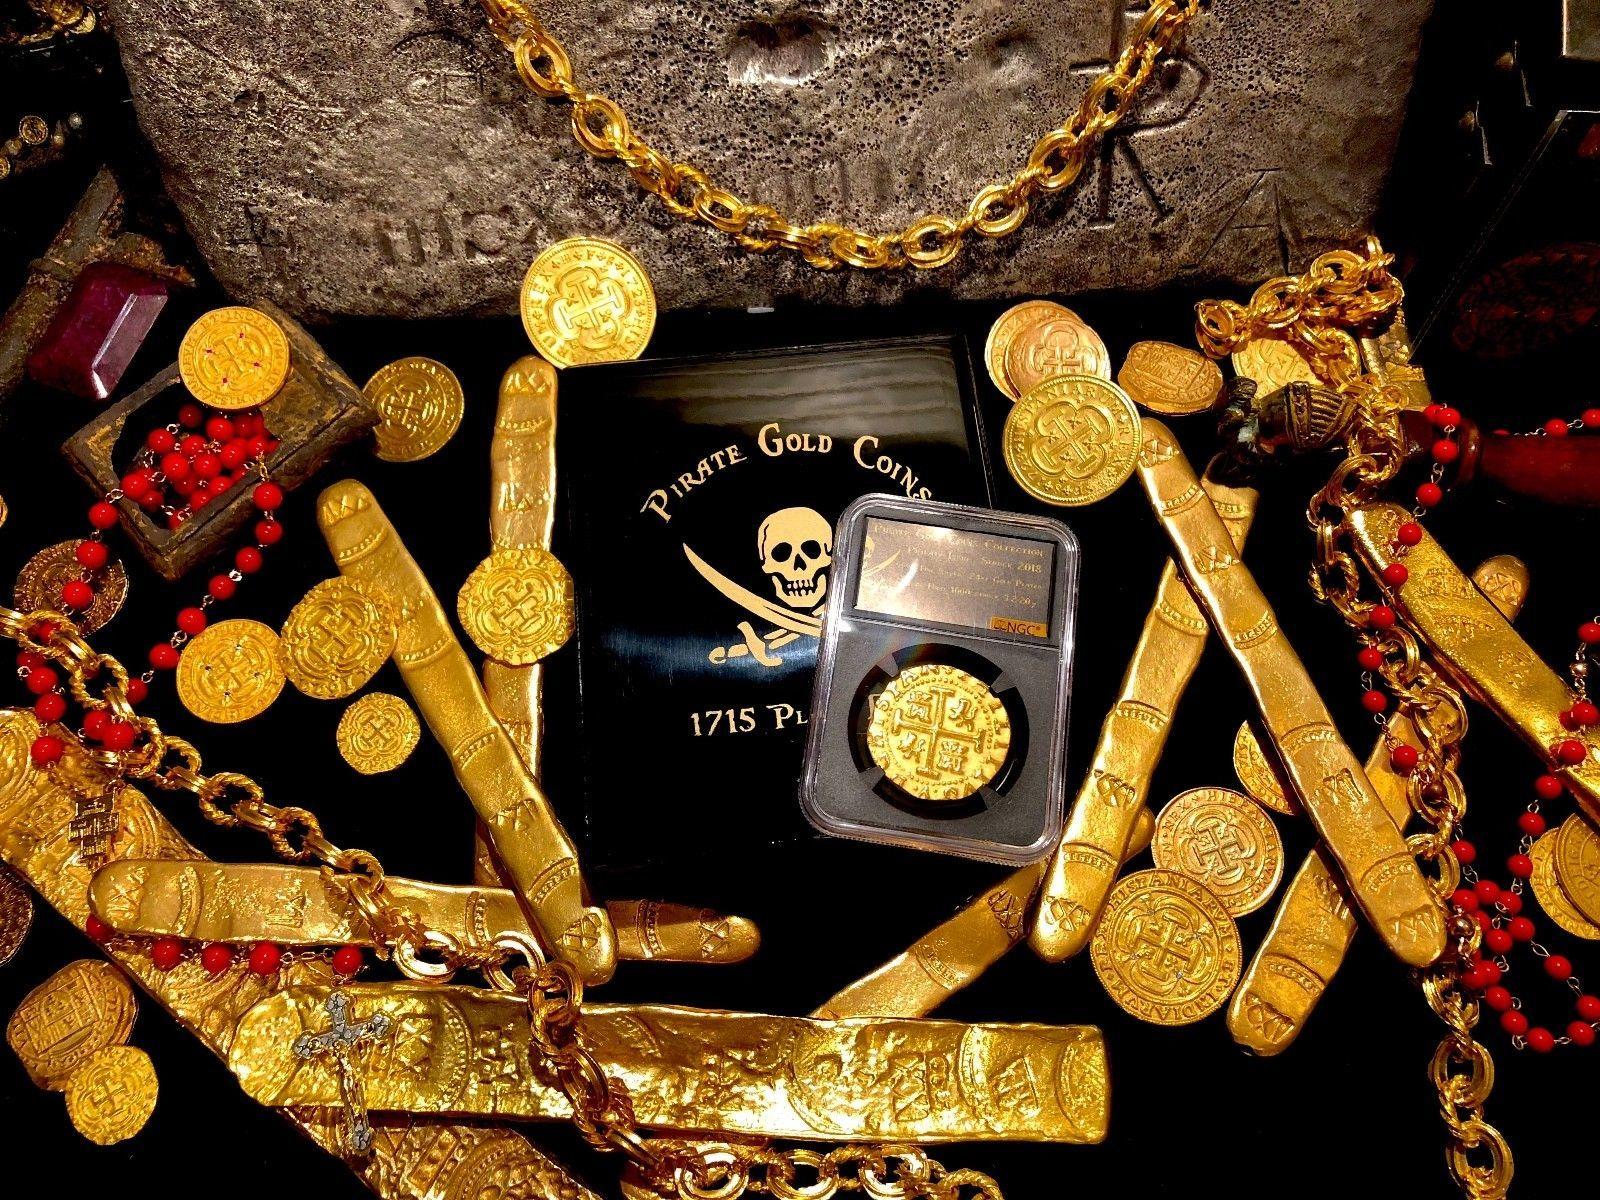 PERU 1708 8 ESCUDOS NGC GOLD PLT 1715 SHIPWRECK PIRATE TREASURE COIN JEWELRY